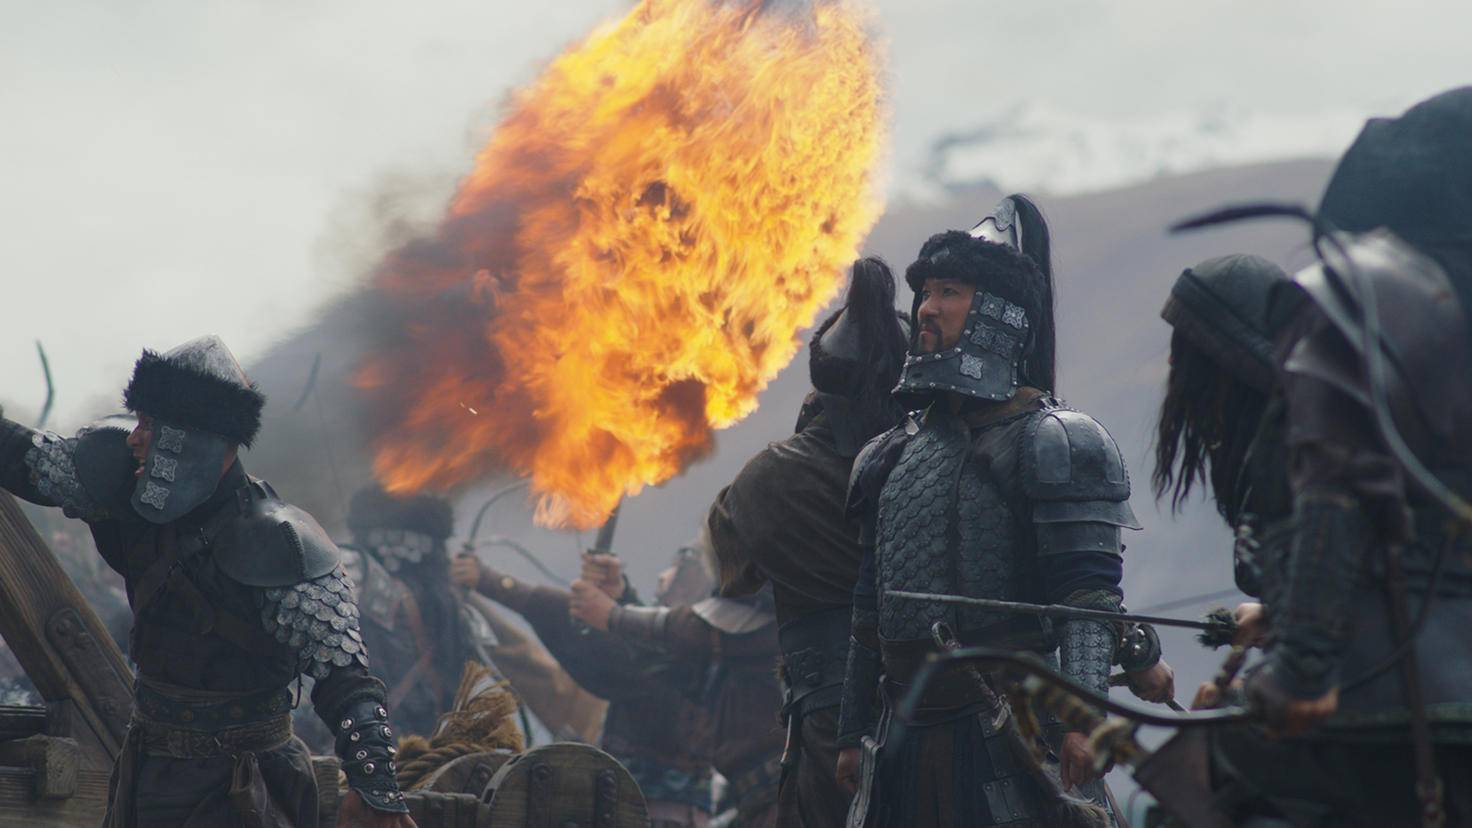 Jason Scott Lee (rechts neben dem Feuerball) darf sich als Bösewicht Bori Khan ordentlich ins Zeug legen.